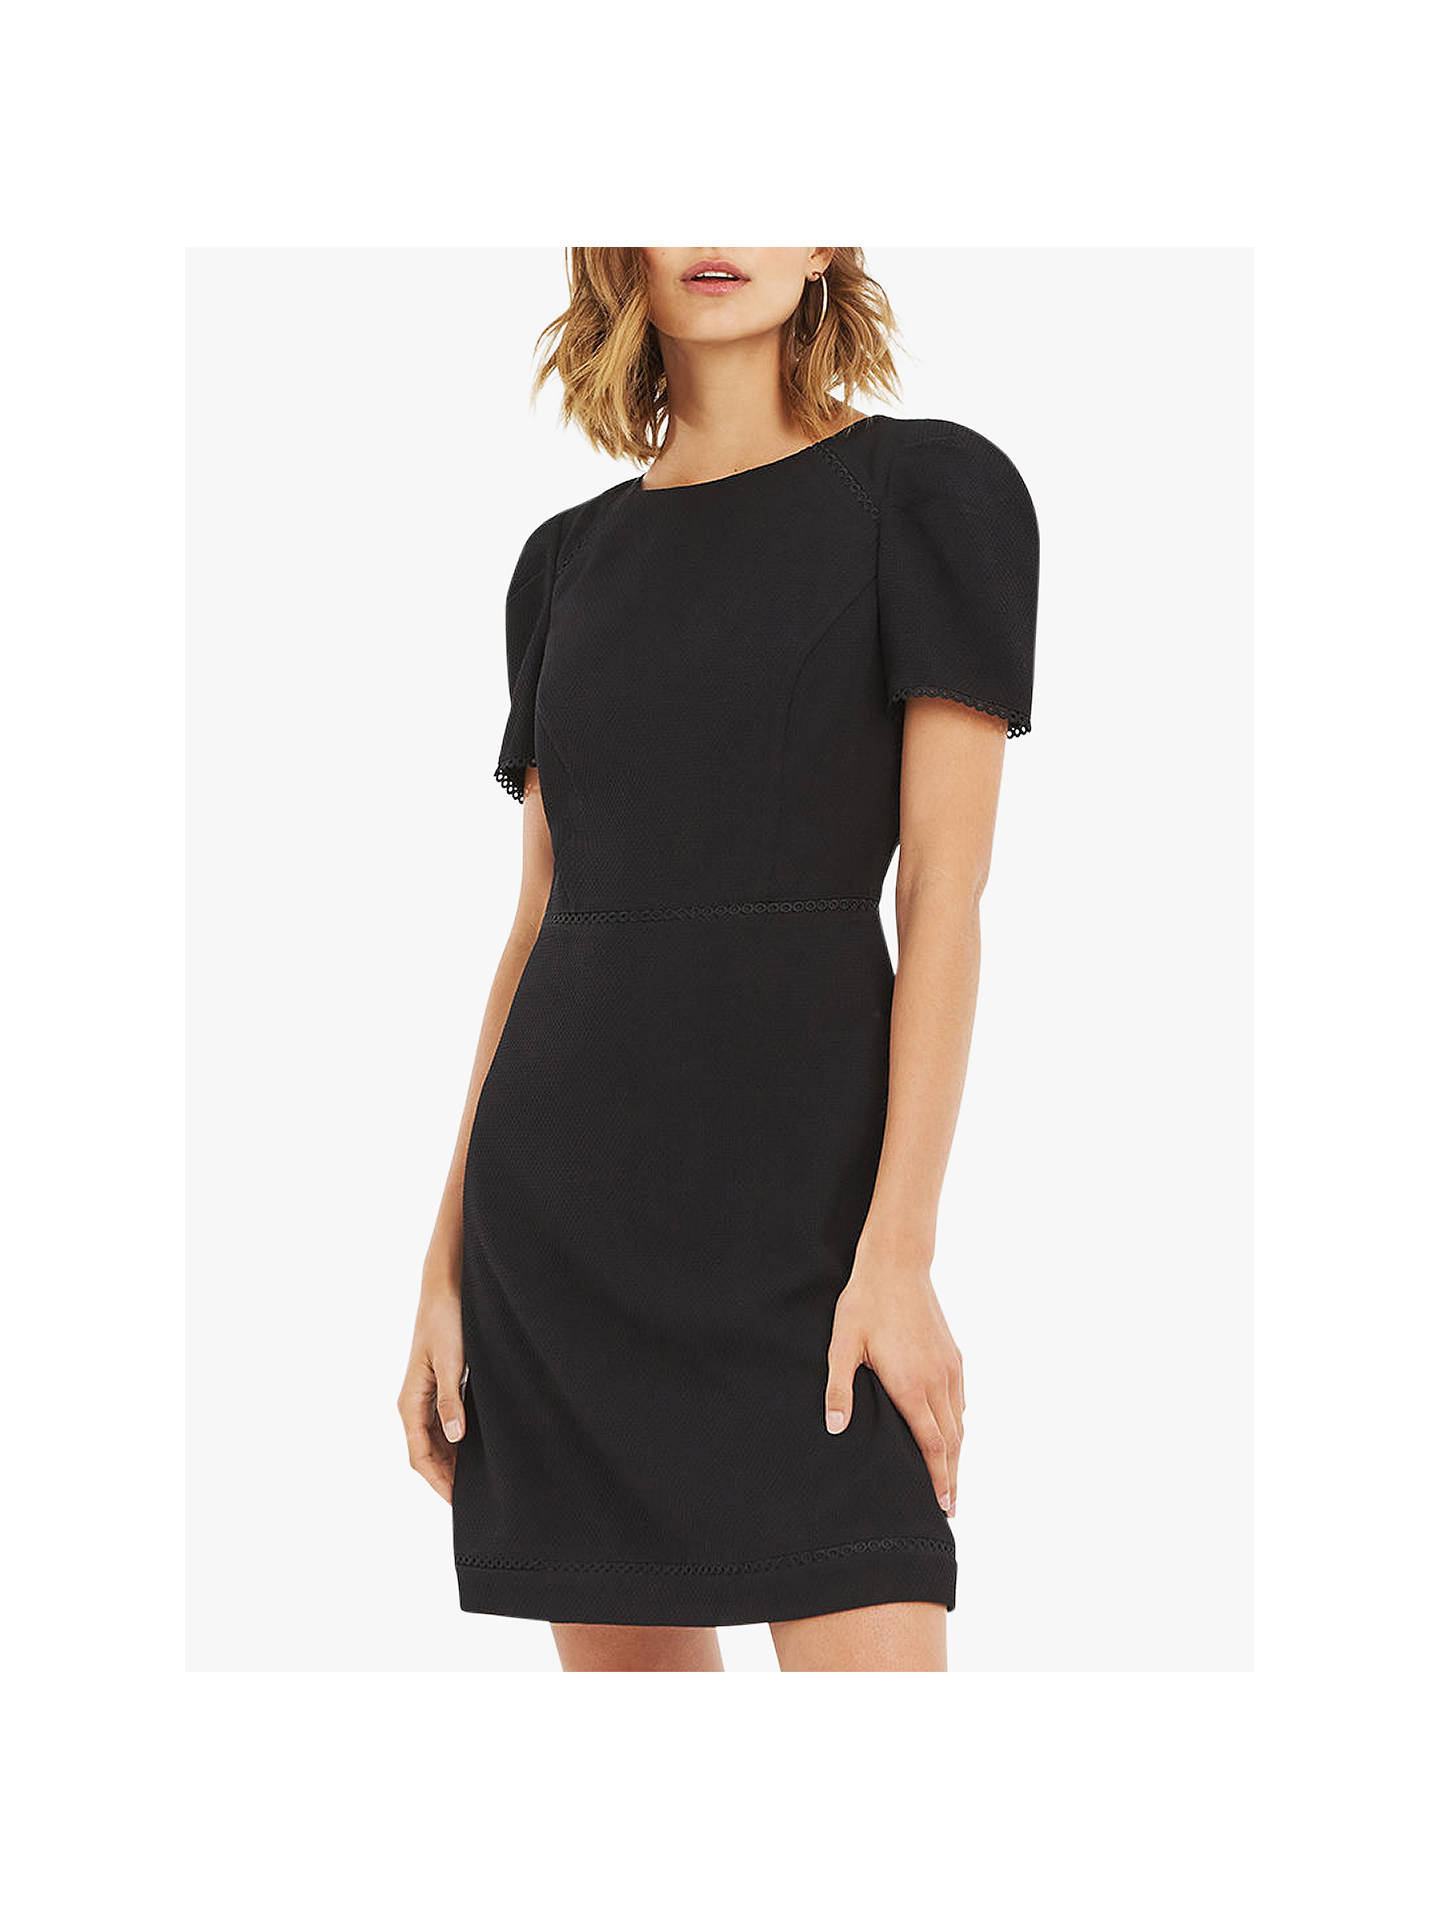 12ec5bfab66a Buy Oasis Circle Trim Dress, Black, 6 Online at johnlewis.com ...